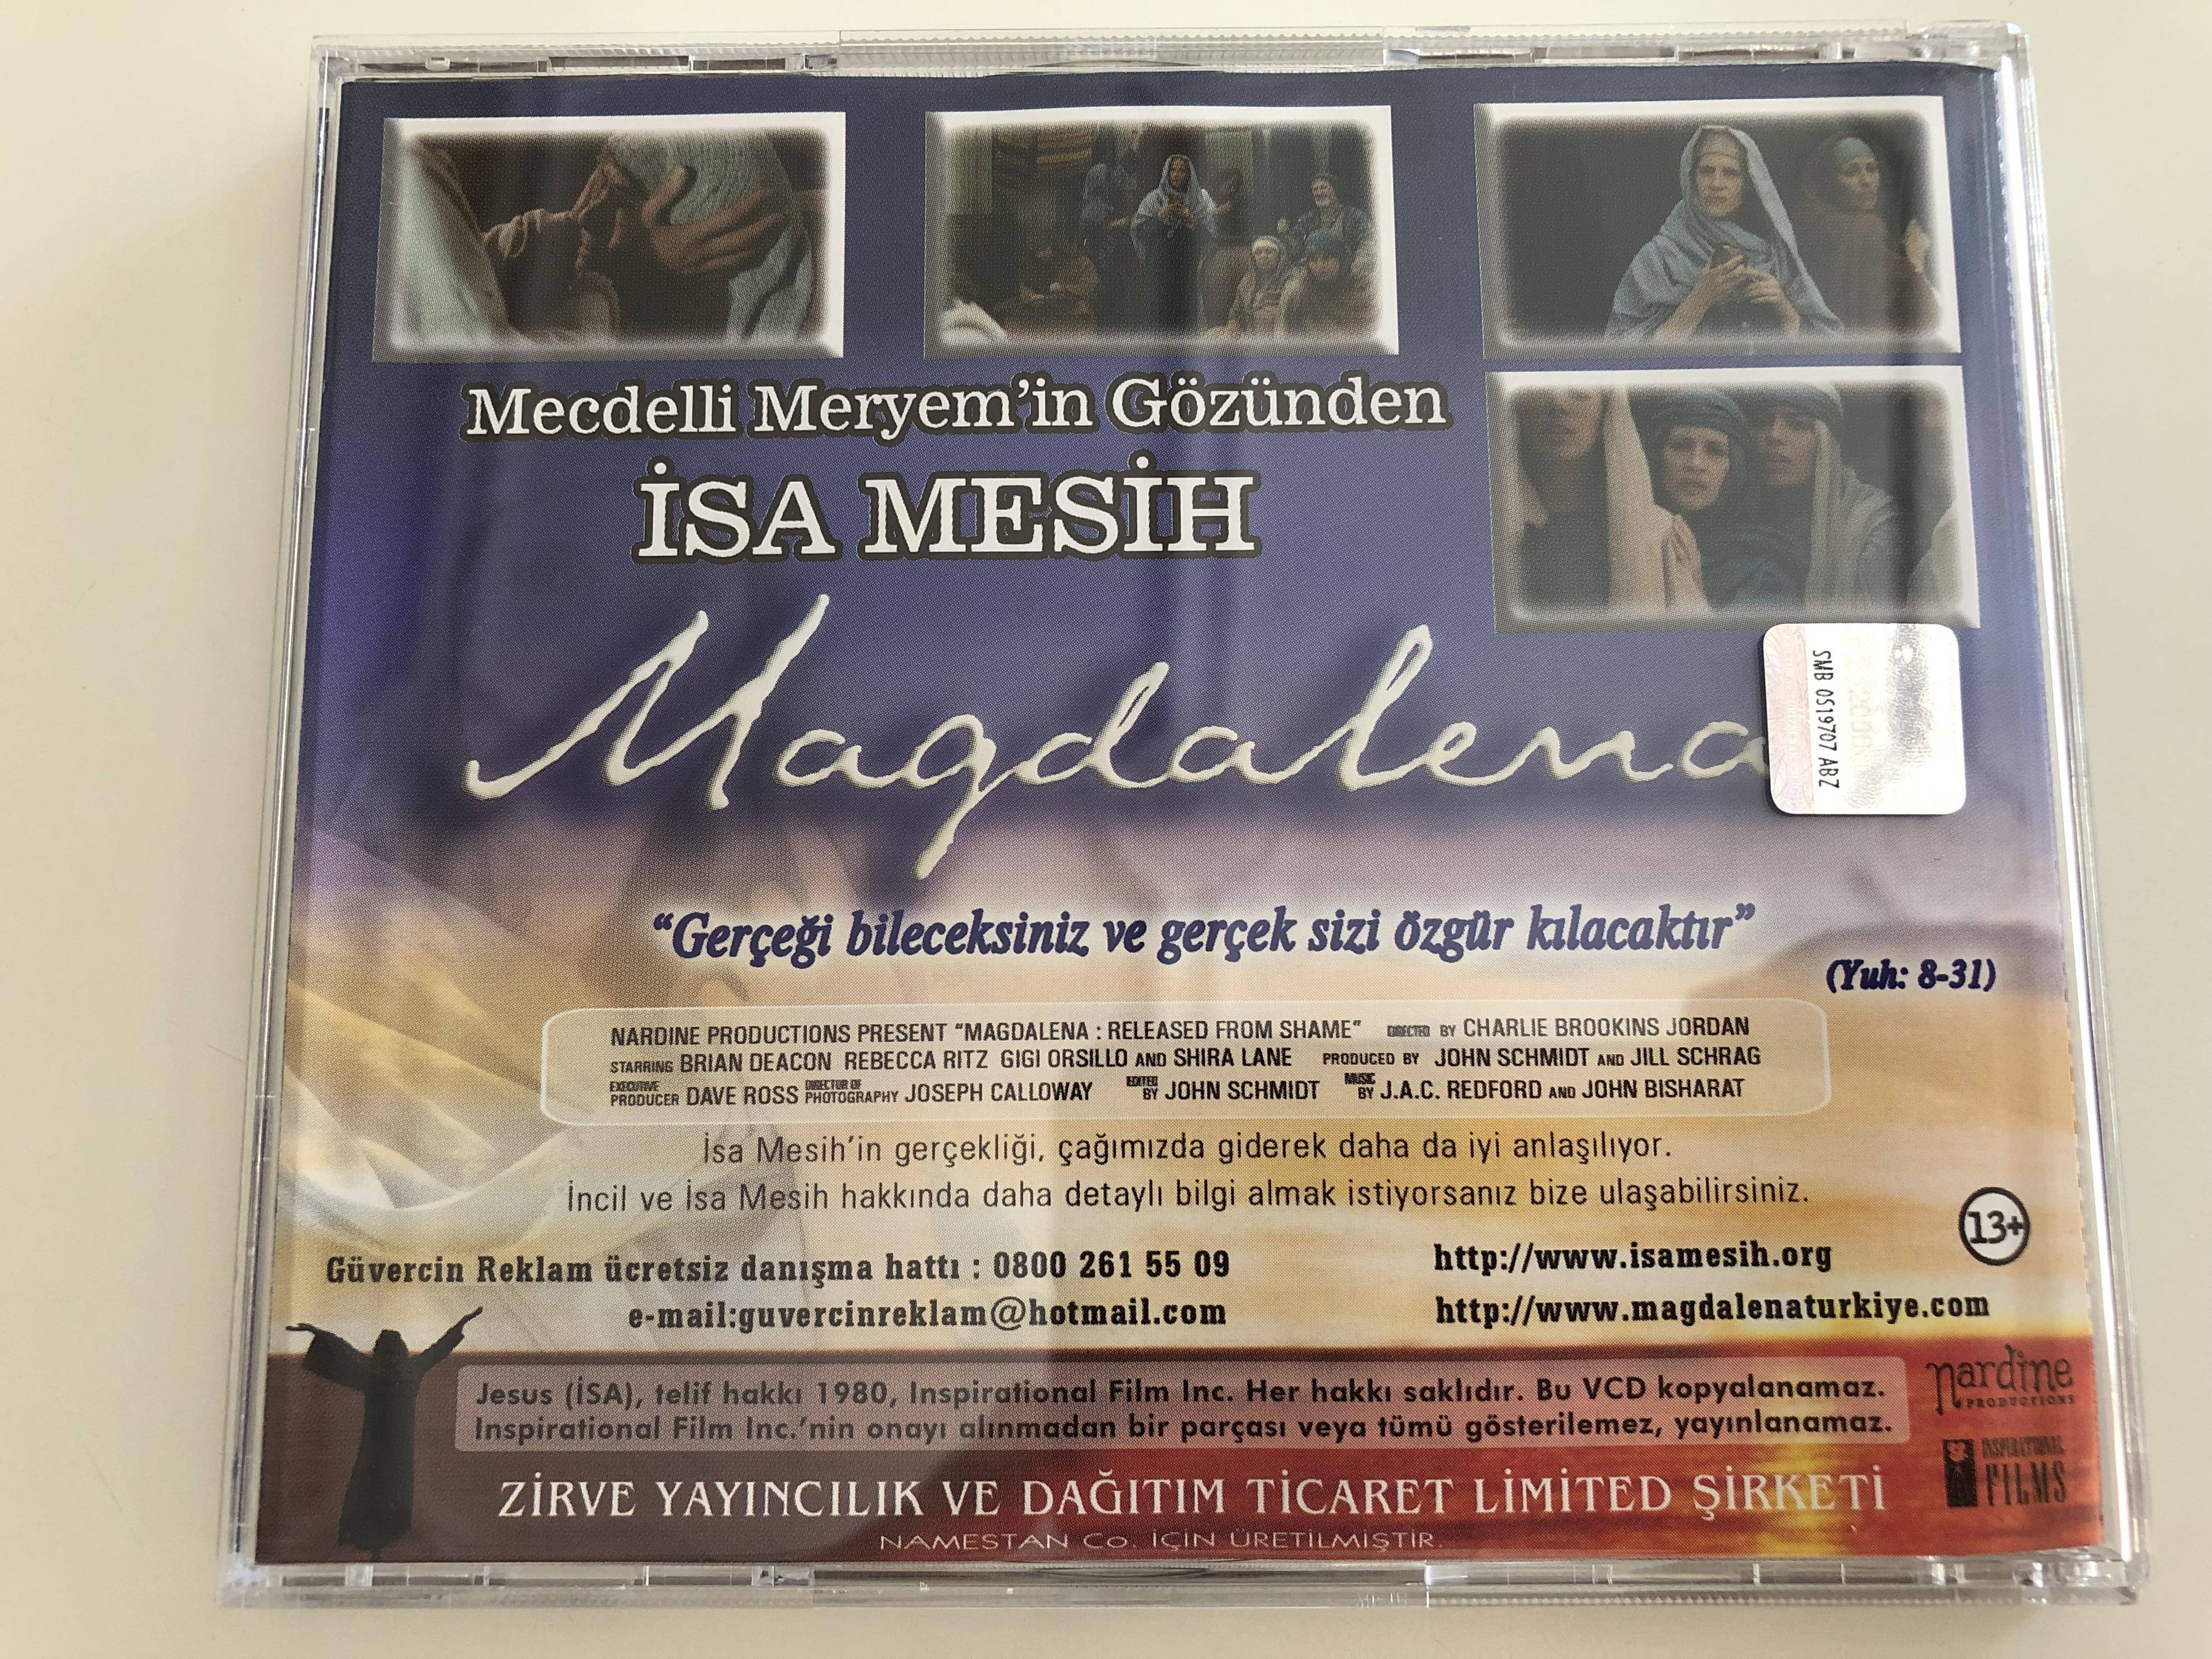 magdalena-released-from-shame-2x-vcd-1980-mecdelli-meryem-in-g-z-nden-sa-mesih-directed-by-charlie-brookins-jordan-starring-brian-deacon-rebecca-ritz-gigi-orsillo-shira-lane-9-.jpg